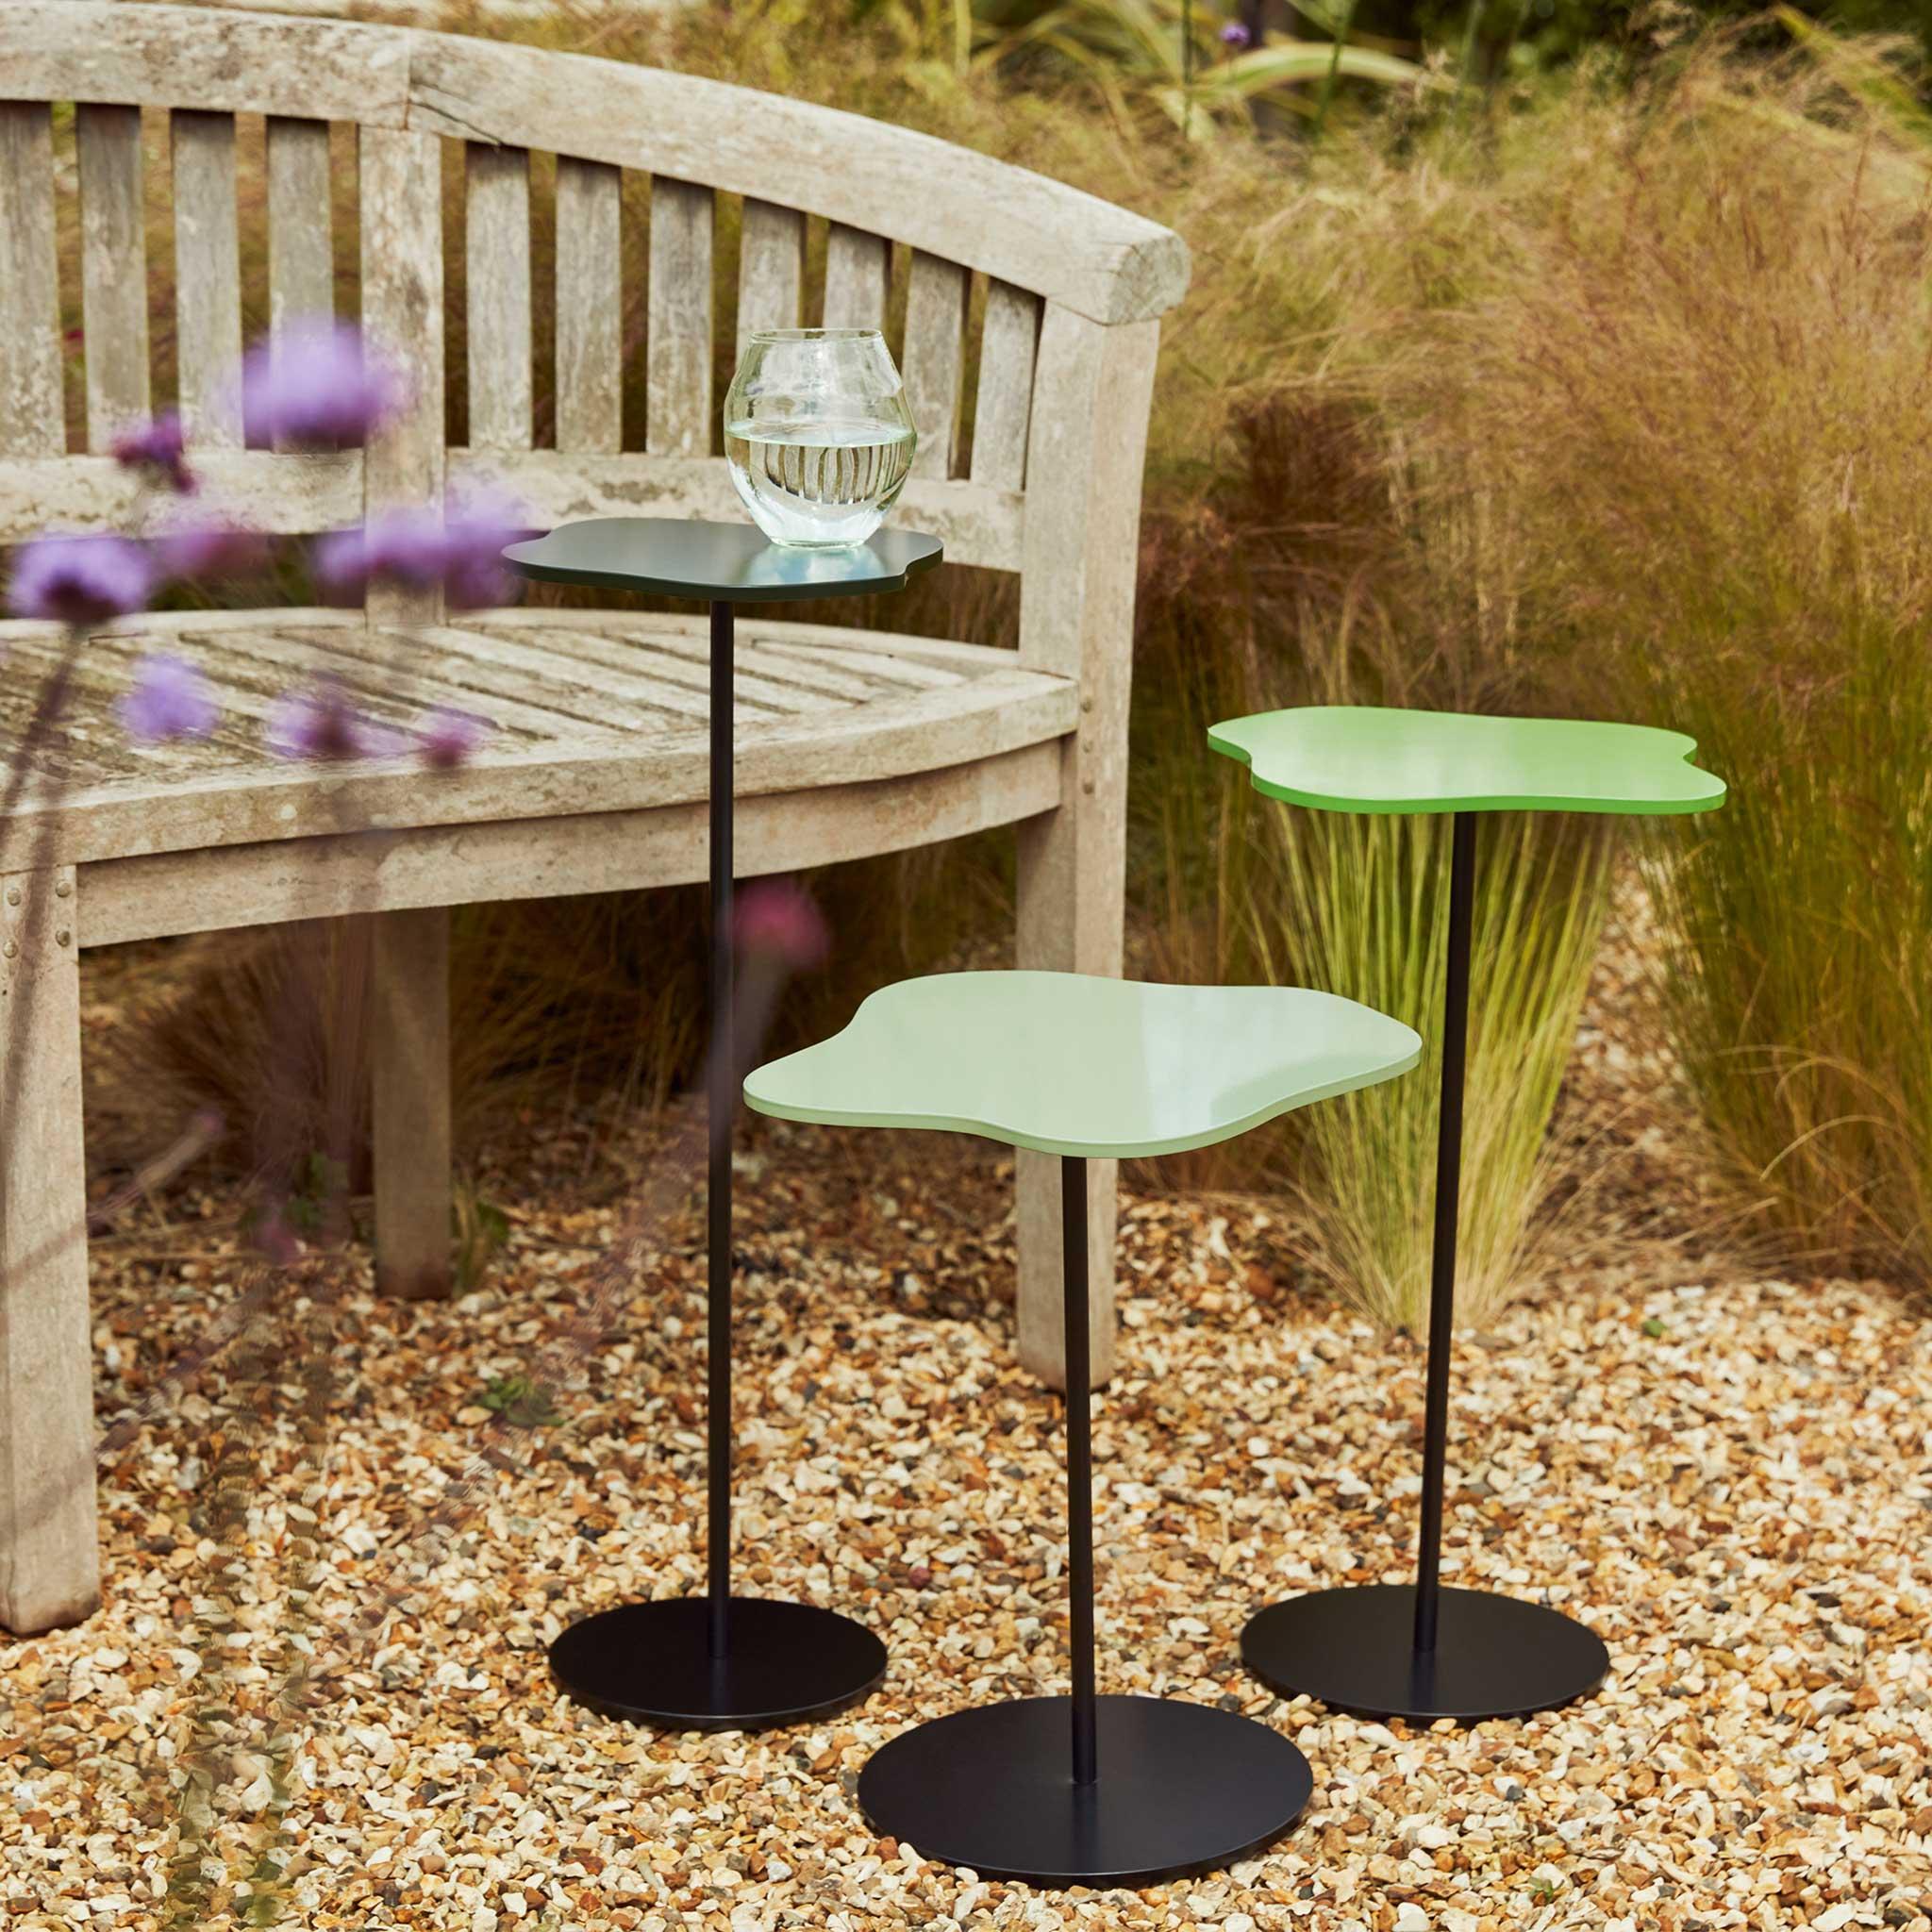 Garden-Lily-Forest,-Pistachio,-Grass